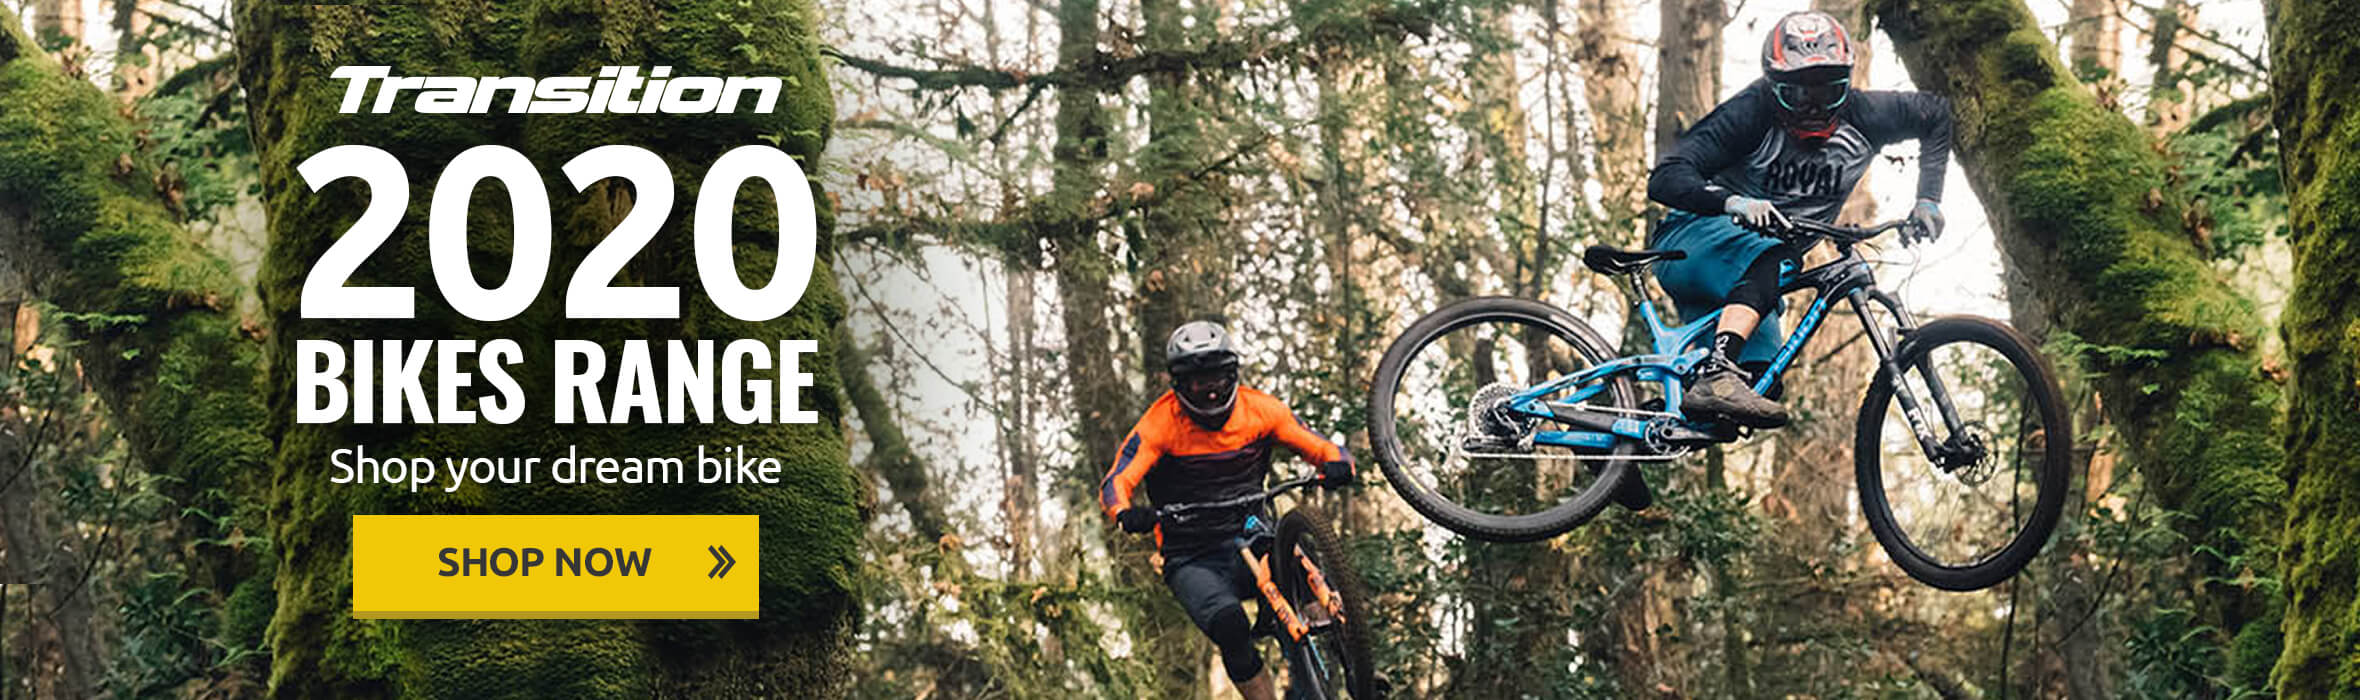 Transition Bikes 2020 Range